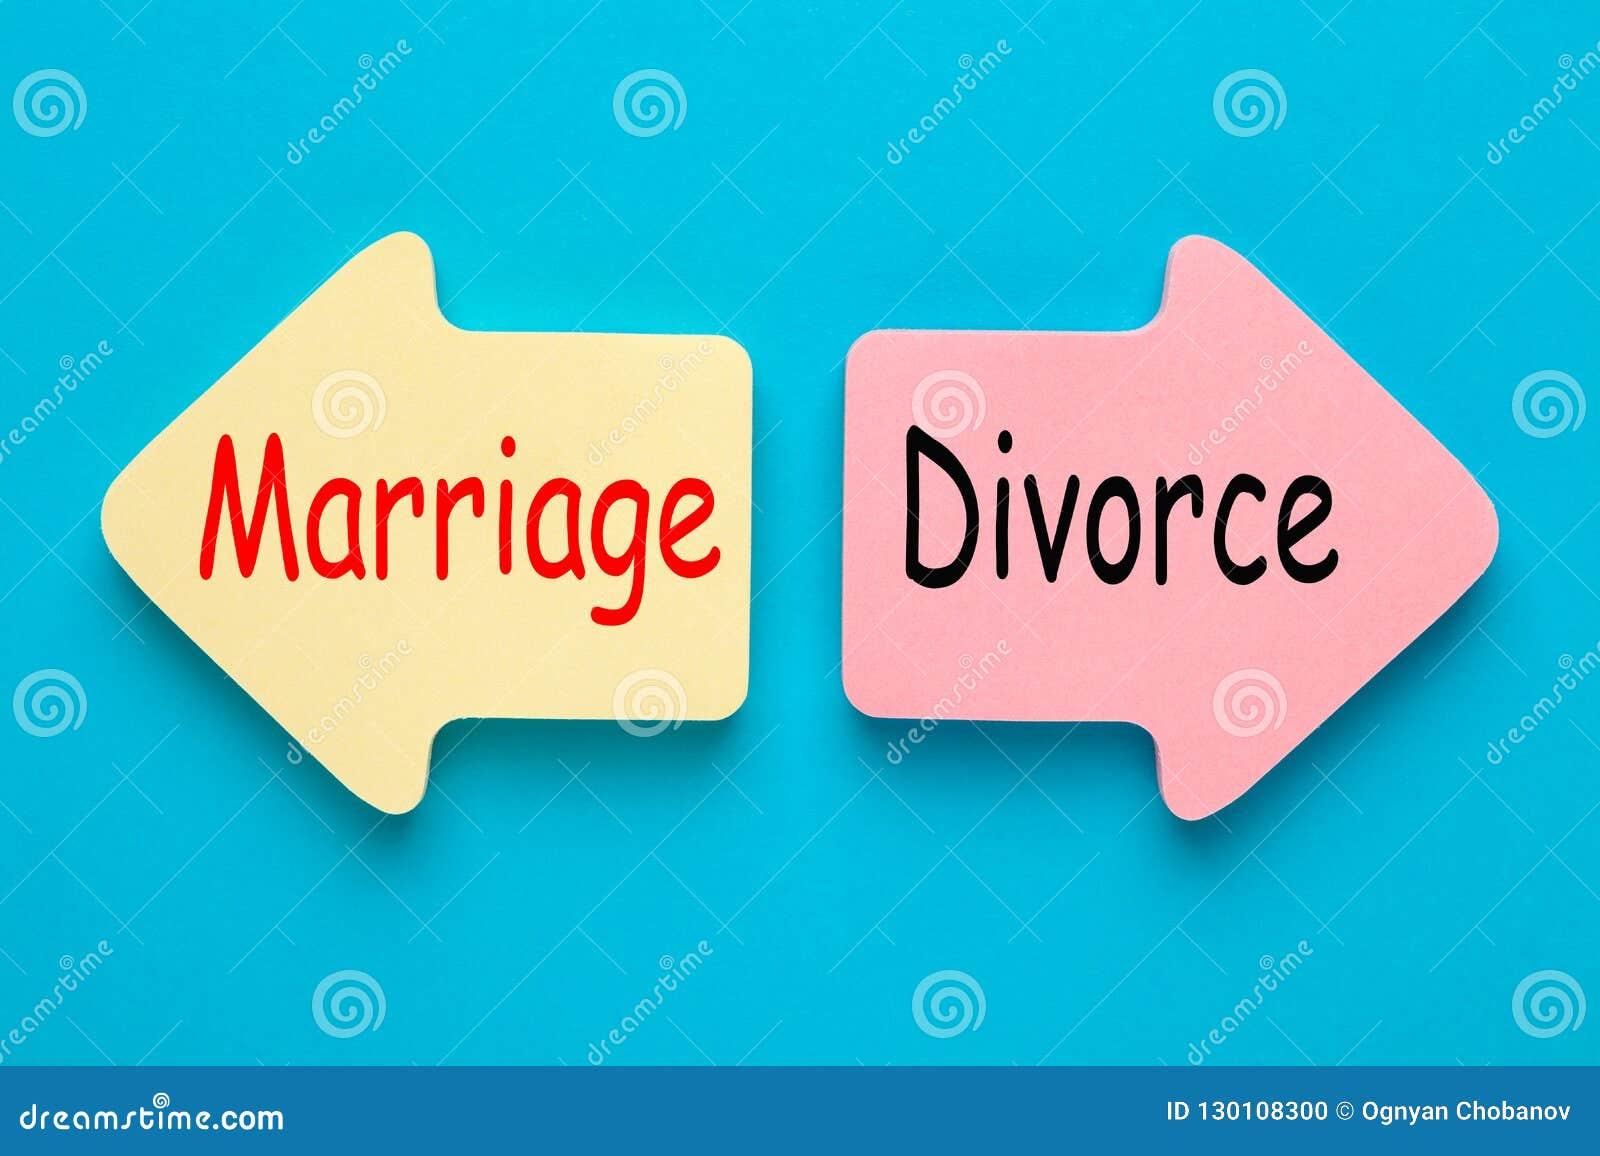 婚姻和离婚